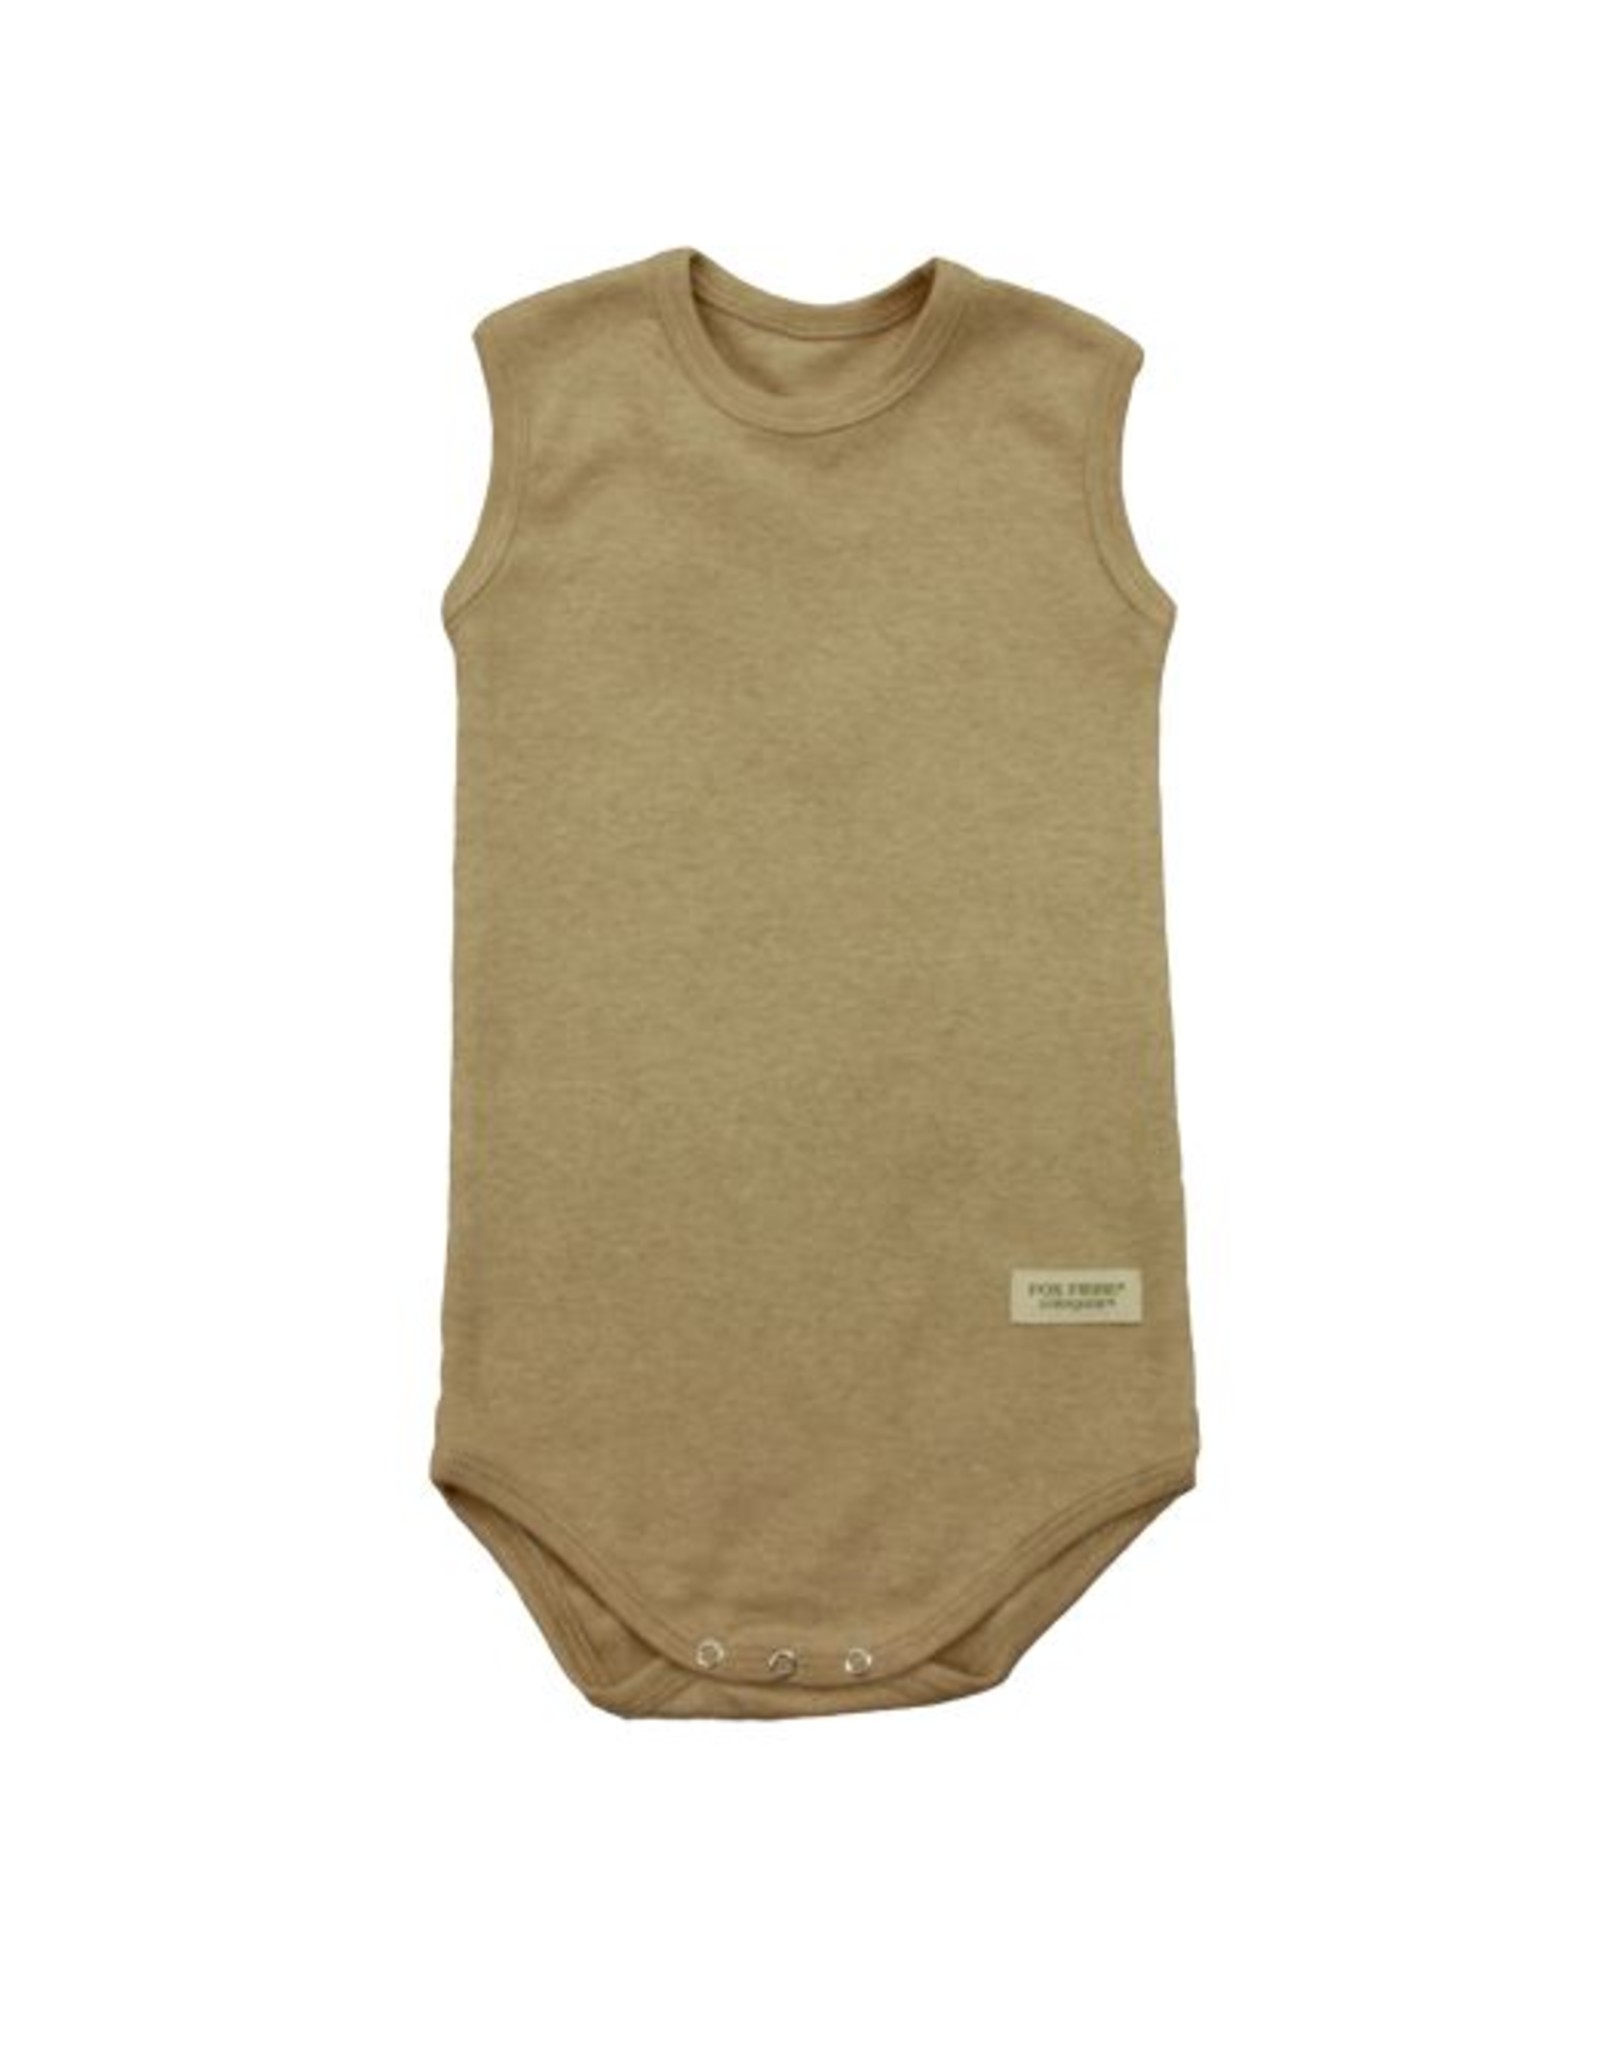 Open sleeveless babybody. Sizes 12 - 18 months